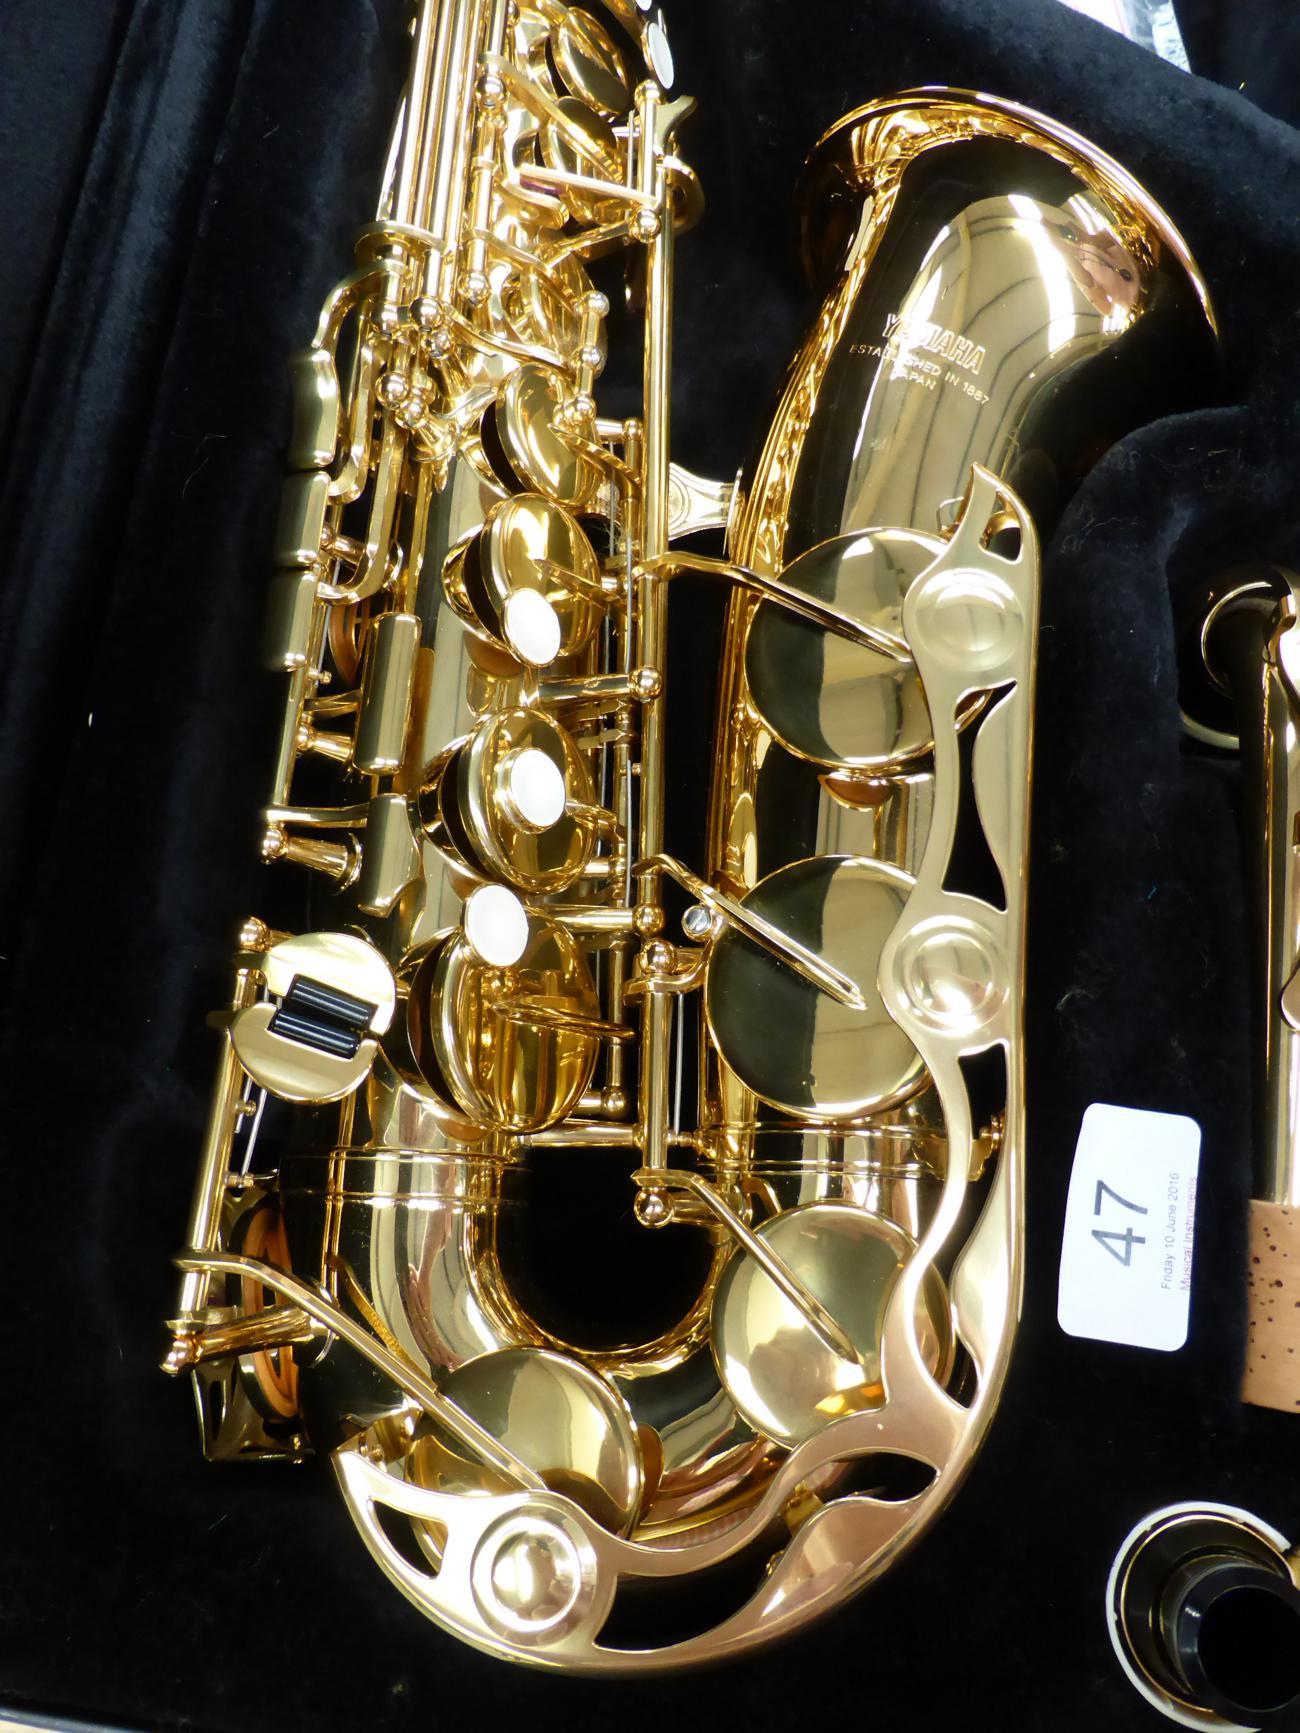 Yamaha saxophone serial number lookup | ЕНТ, ПГК, гранты